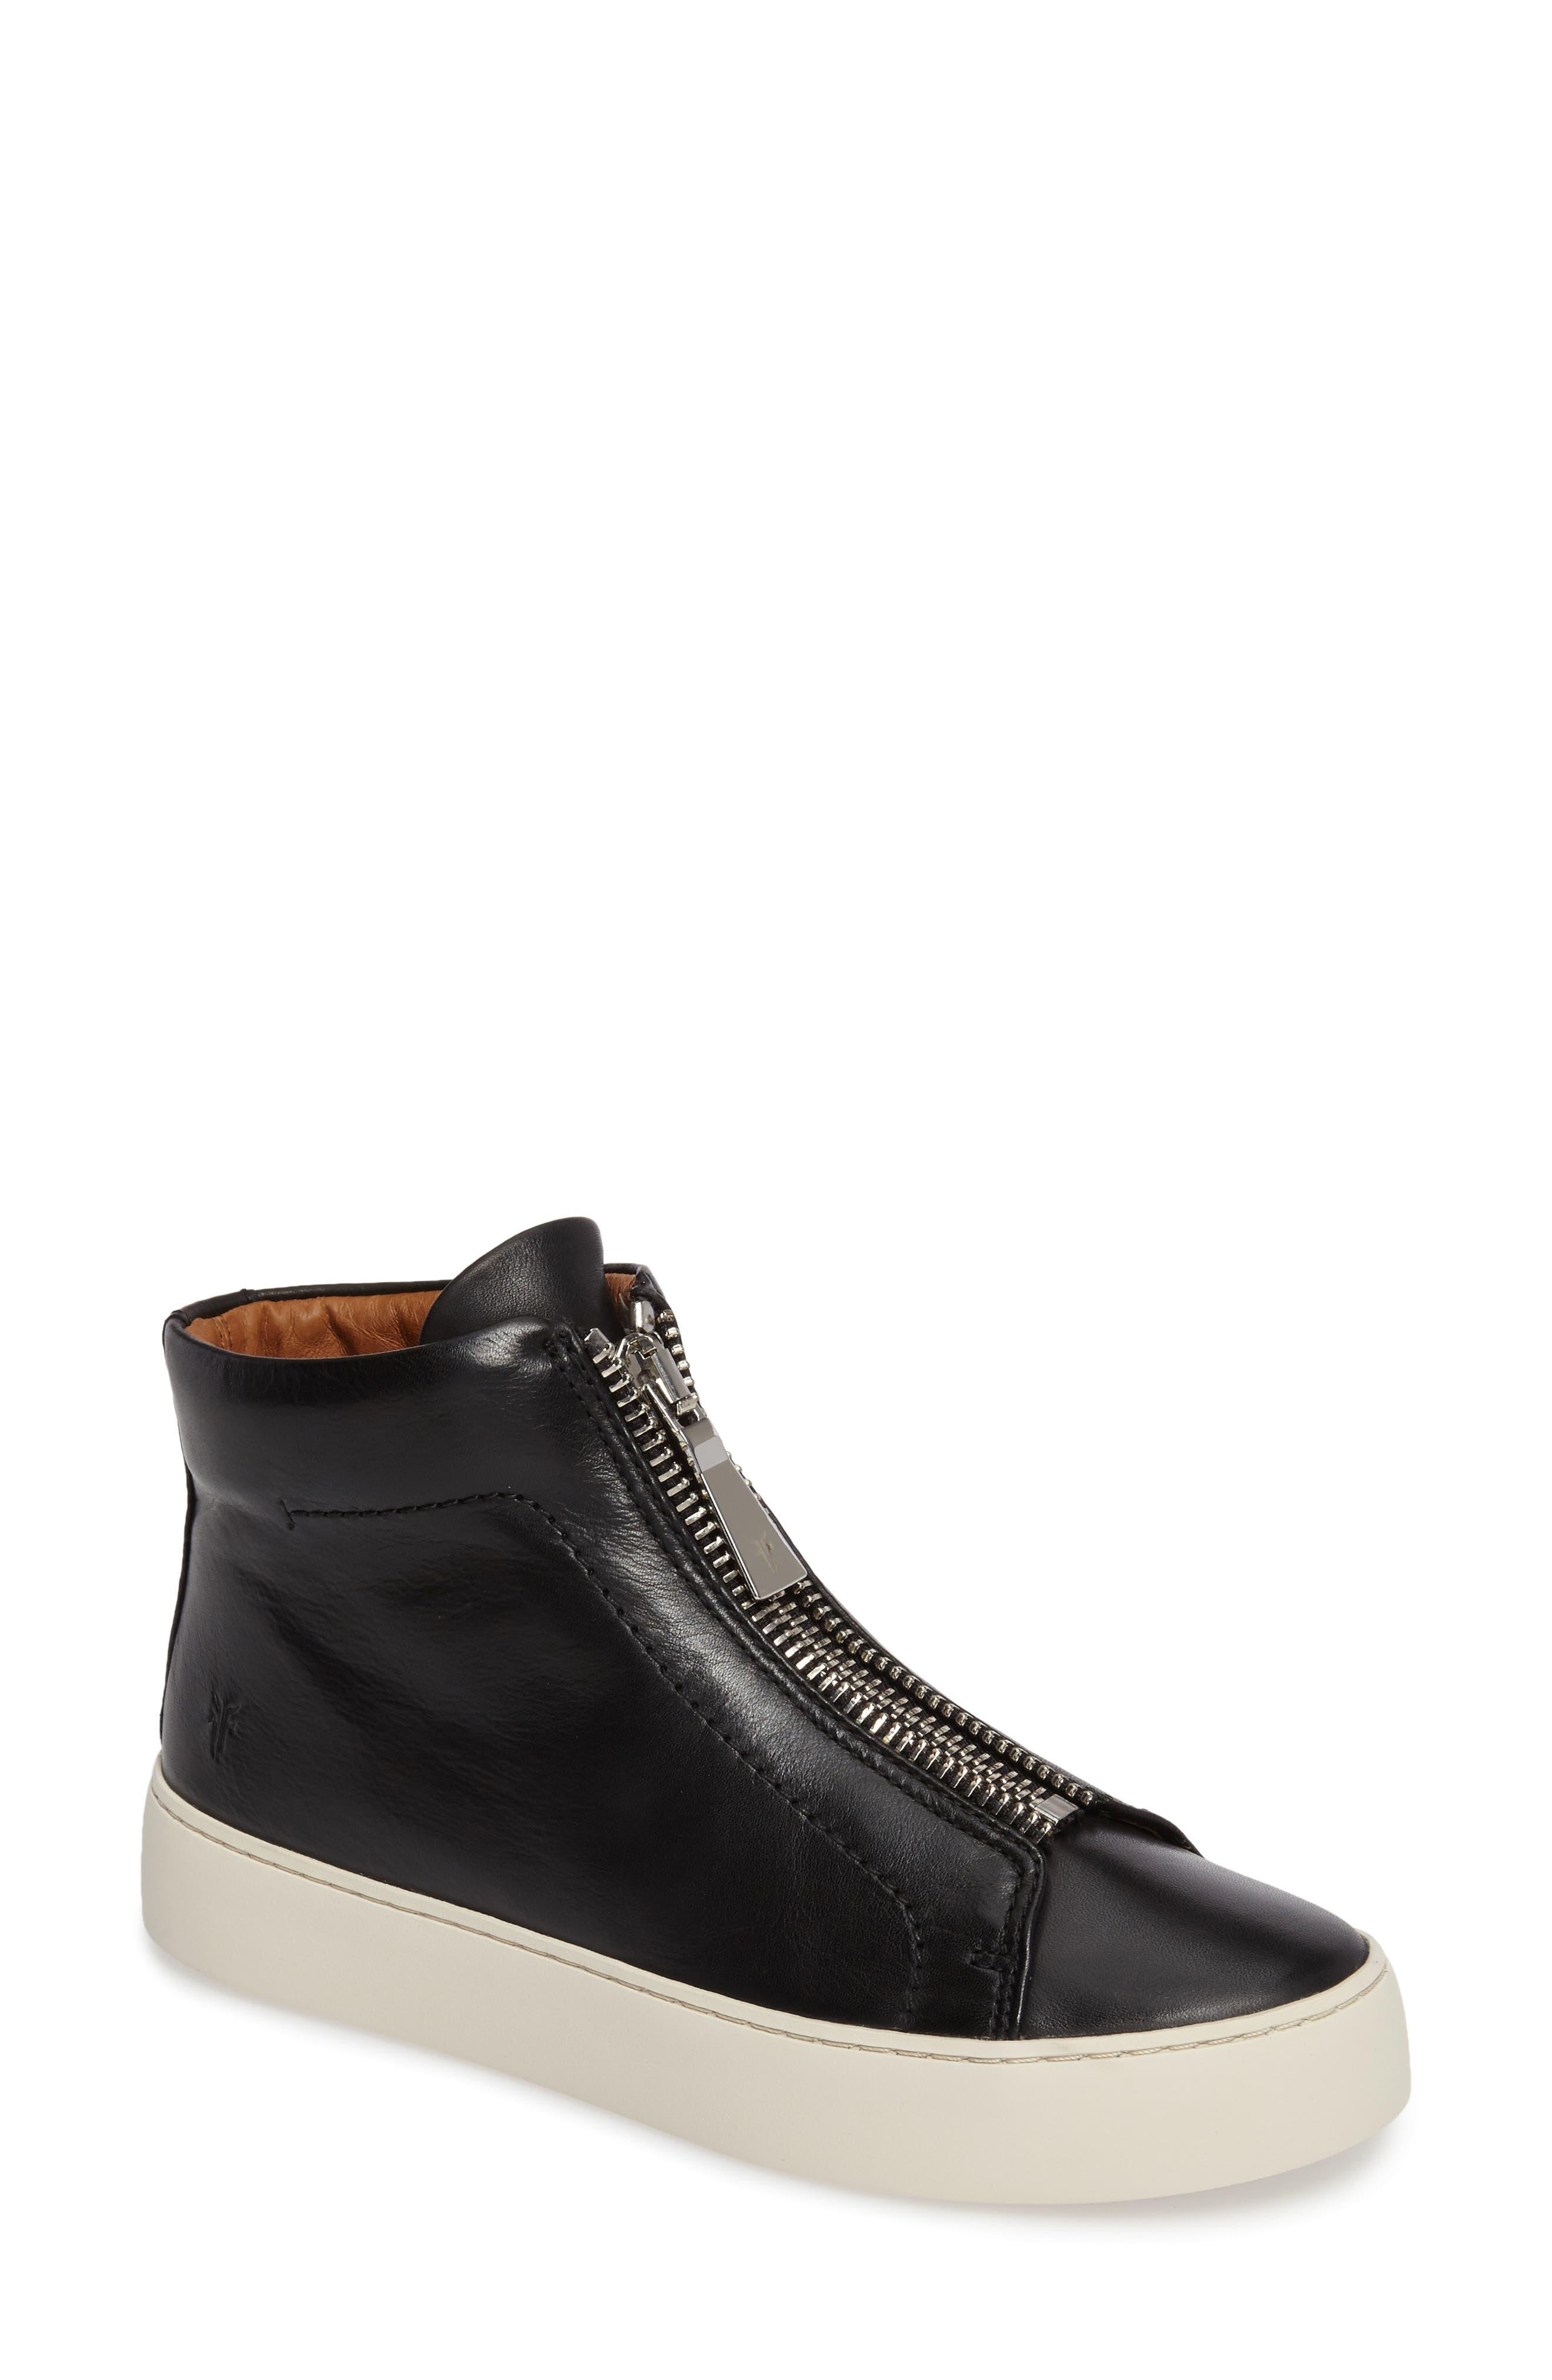 FRYE Lena Zip High Top Sneaker, Main, color, BLACK LEATHER